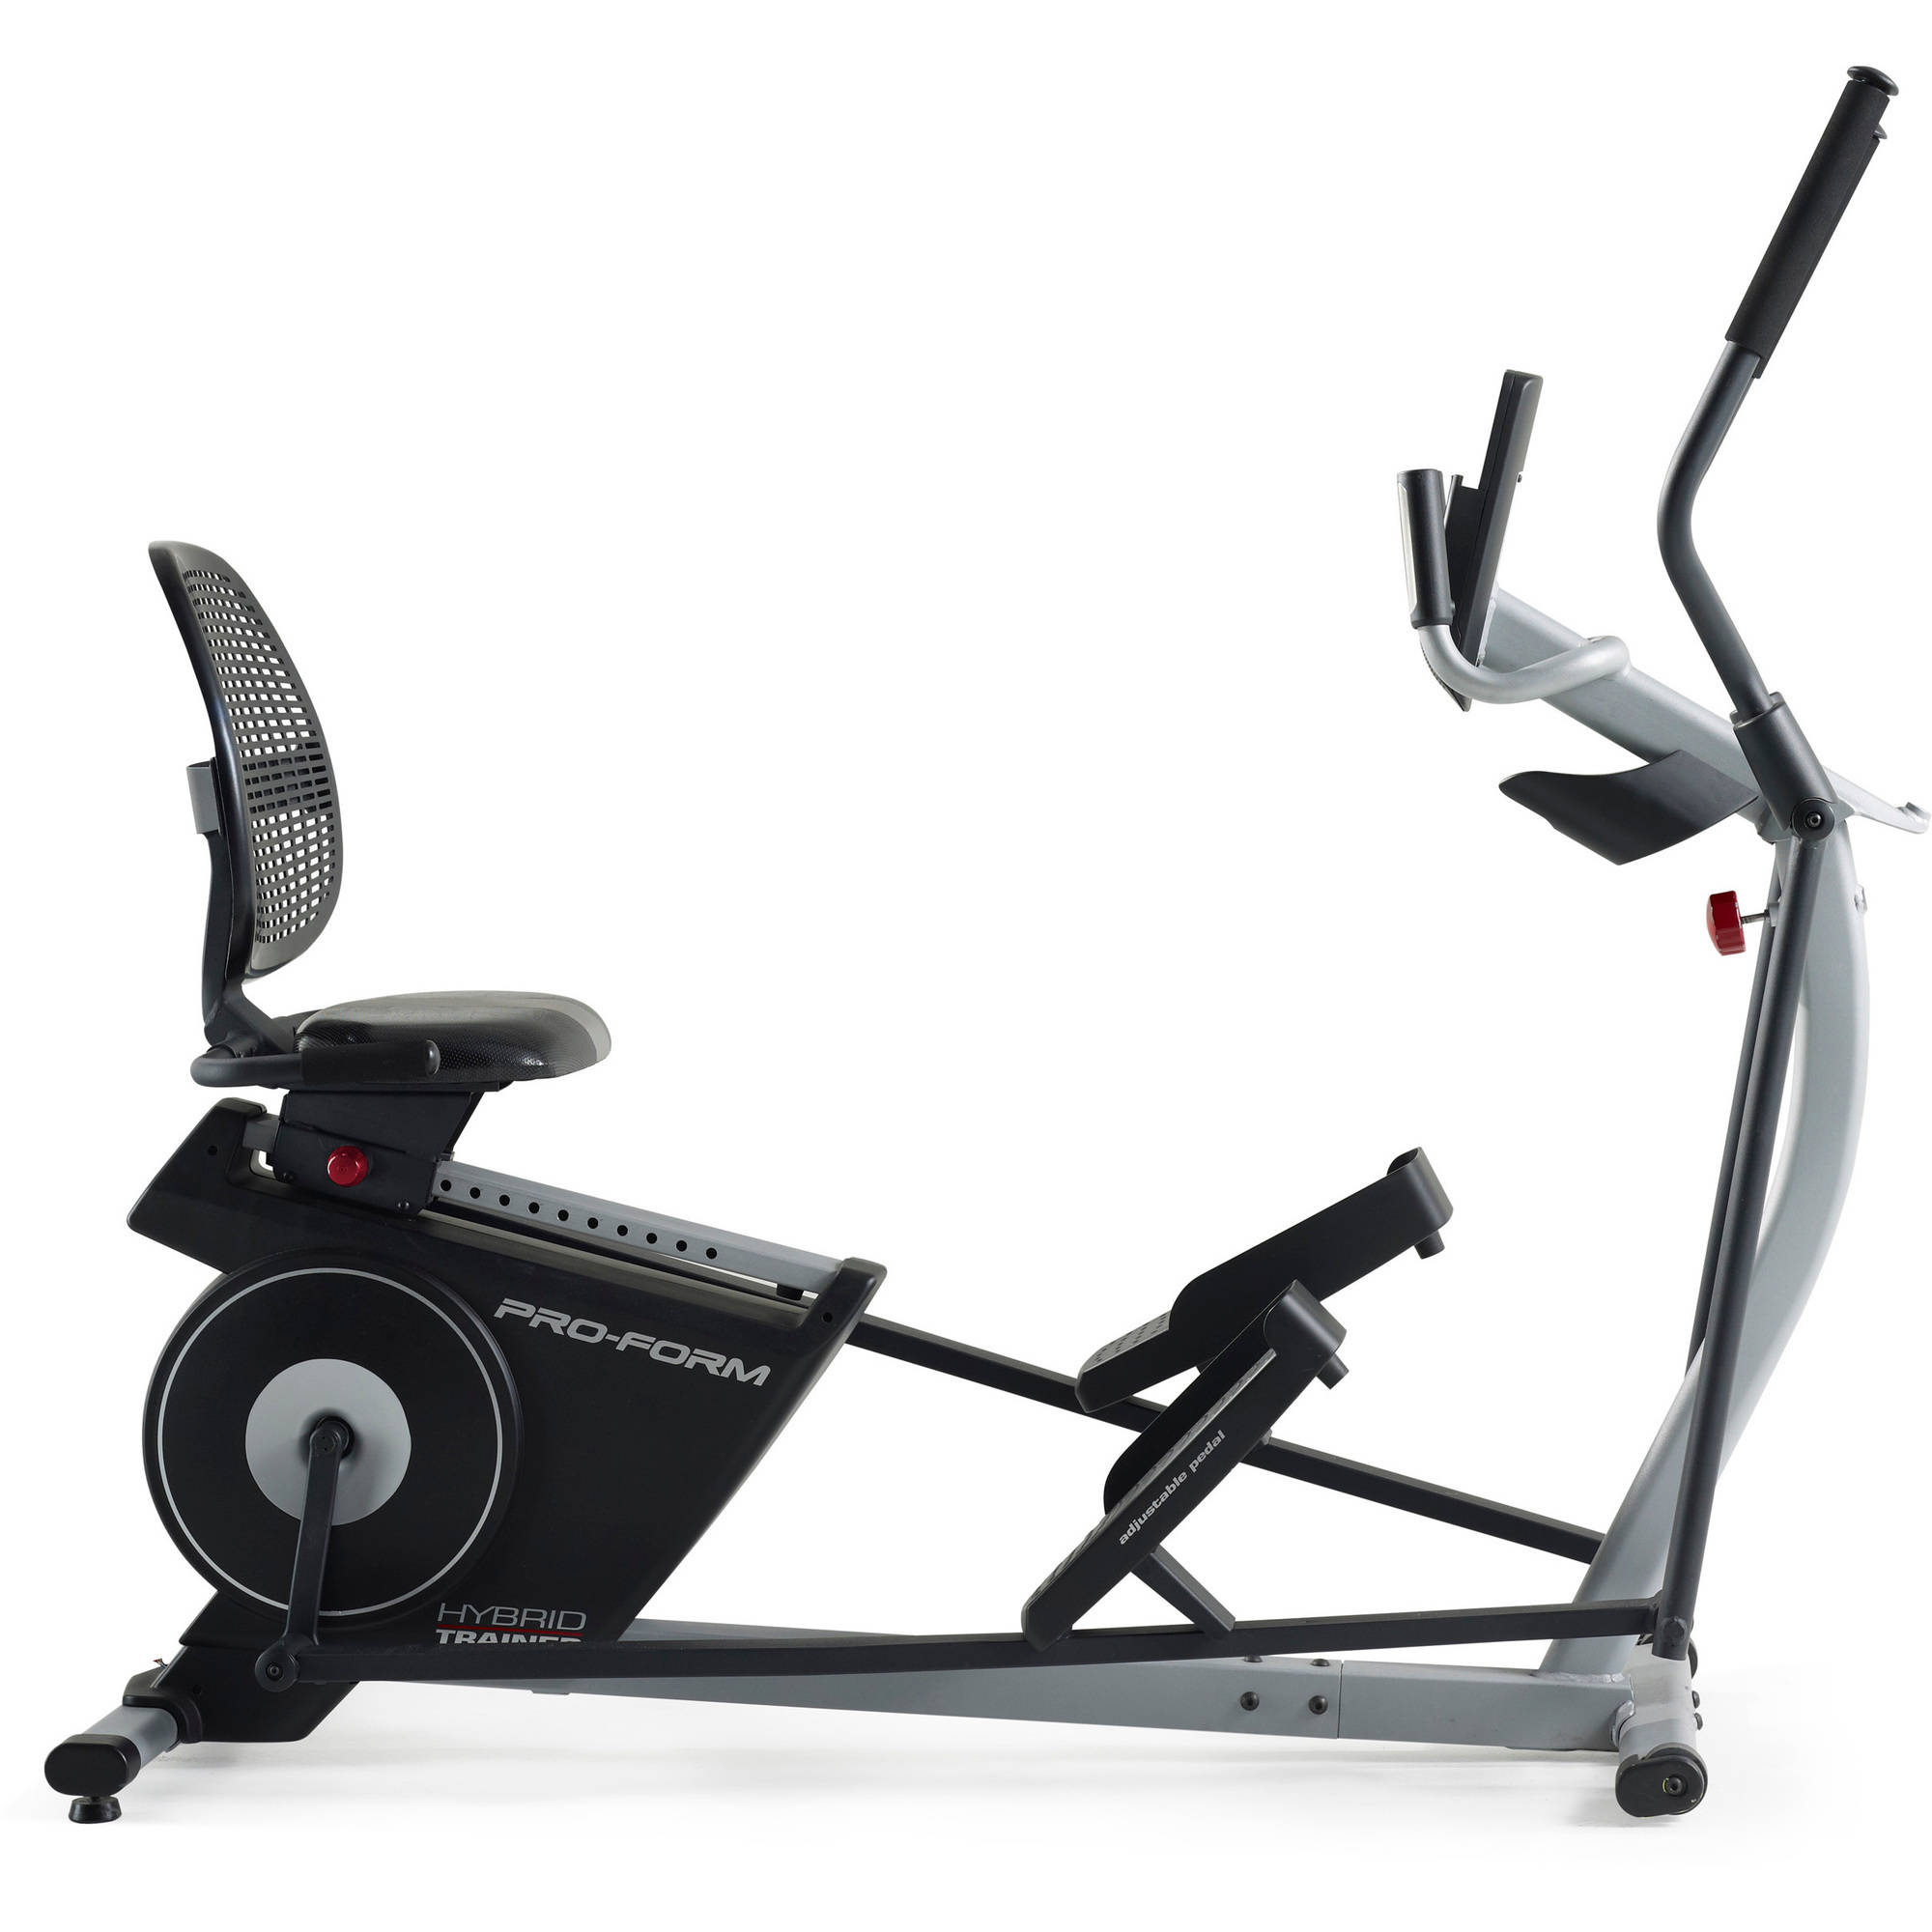 ProForm Hybrid Trainer 2-in-1 Elliptical and Recumbent Bike ...